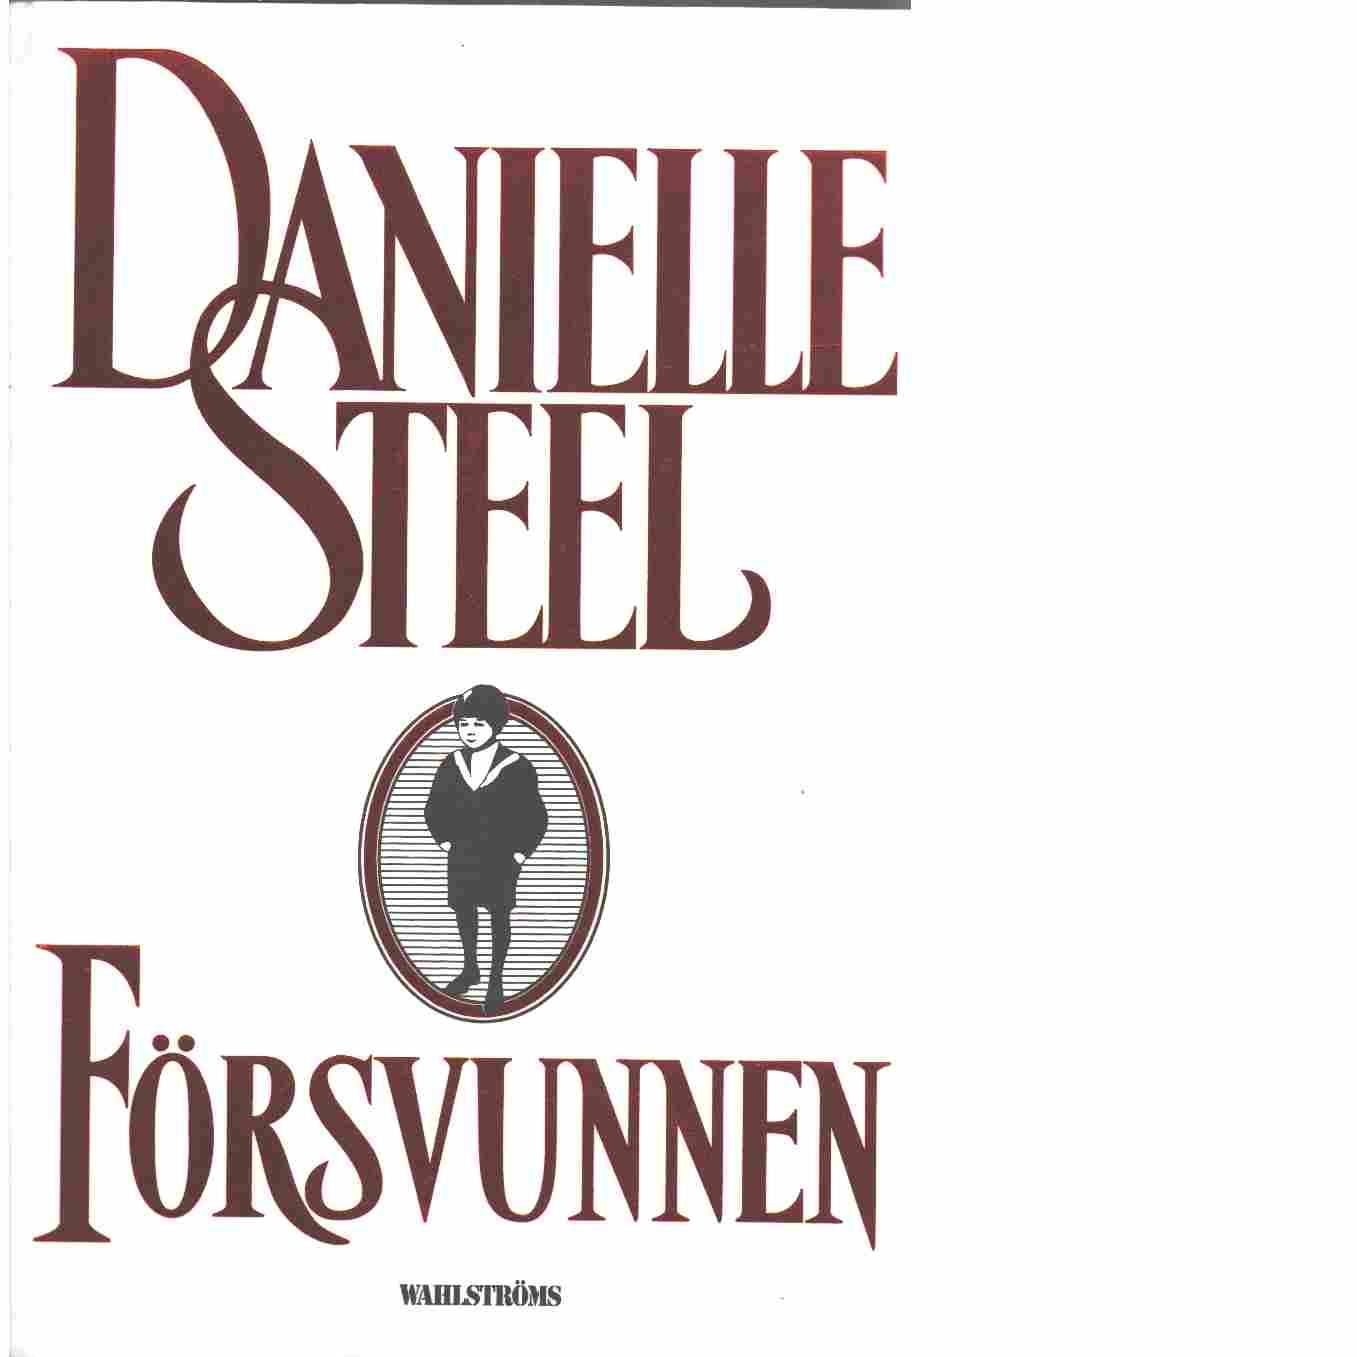 Försvunnen - Steel, Danielle